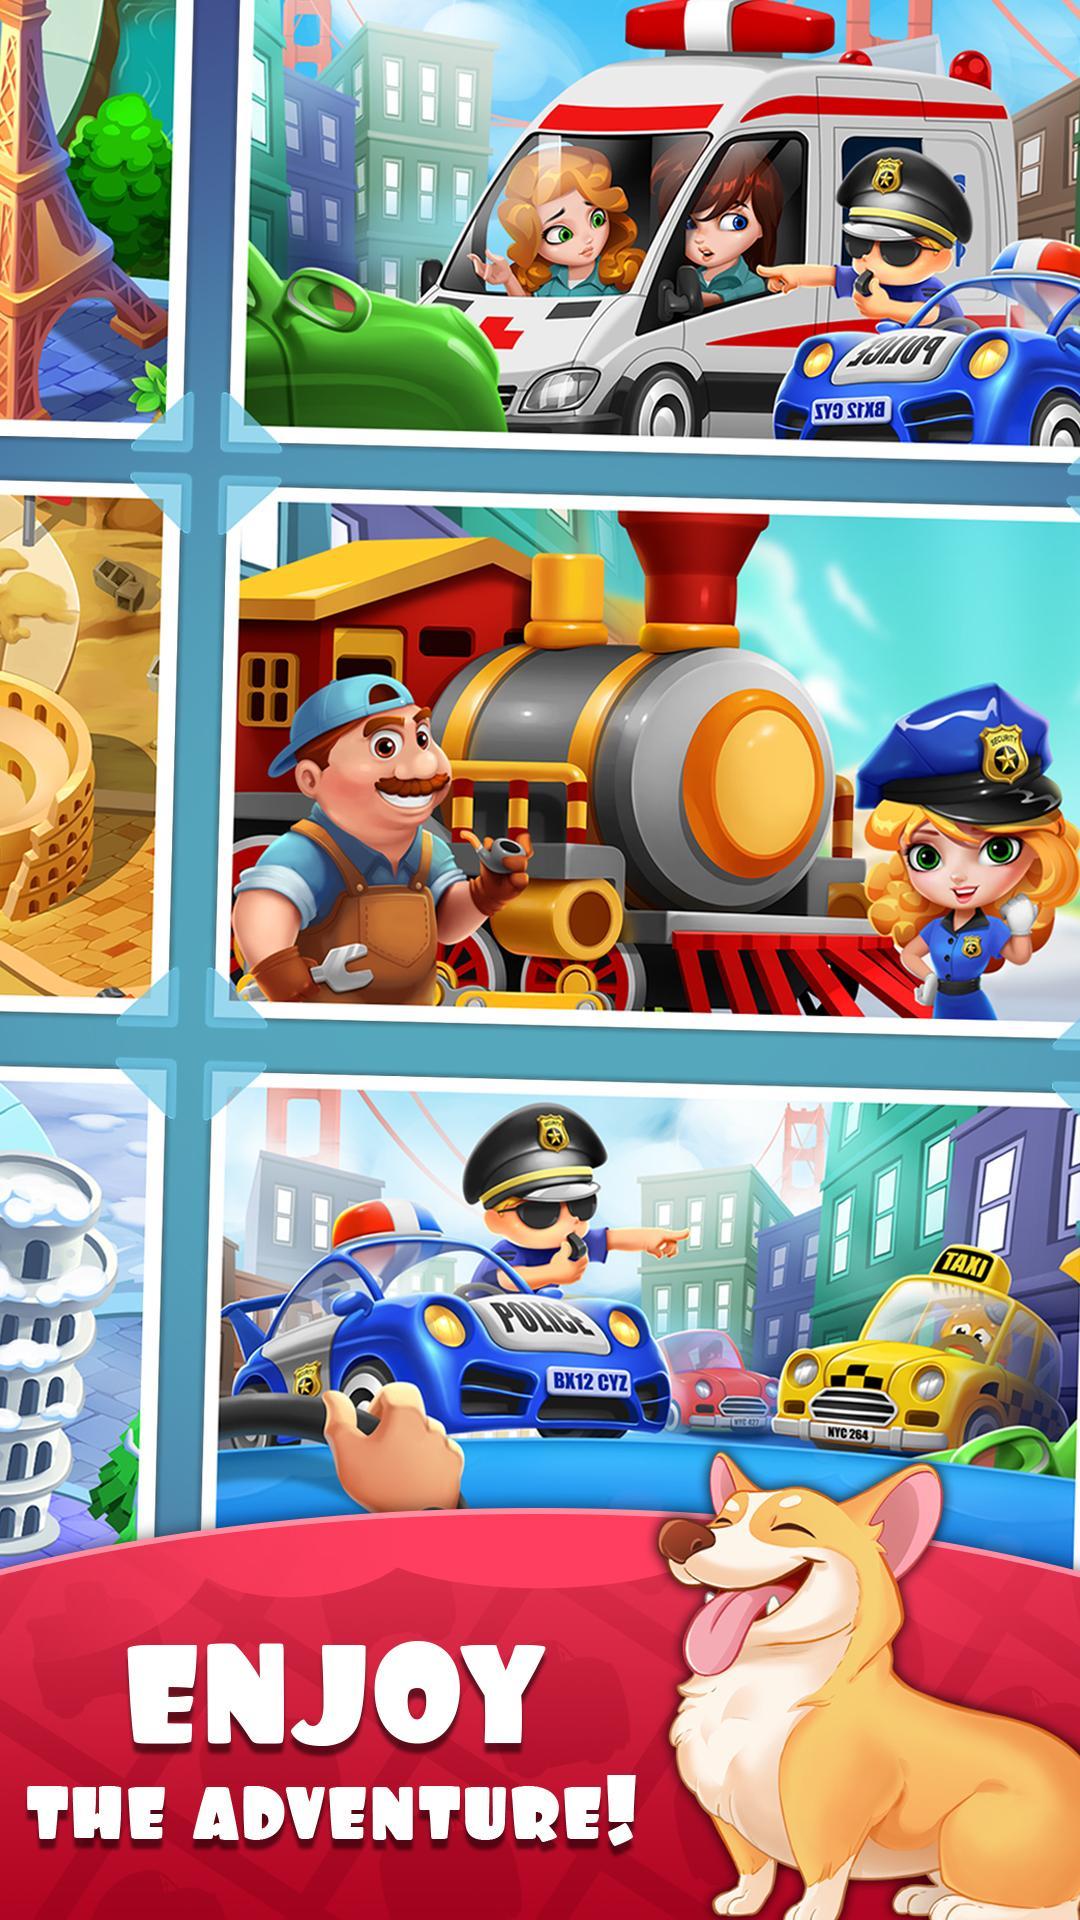 Traffic Jam Cars Puzzle 1.4.21 Screenshot 1